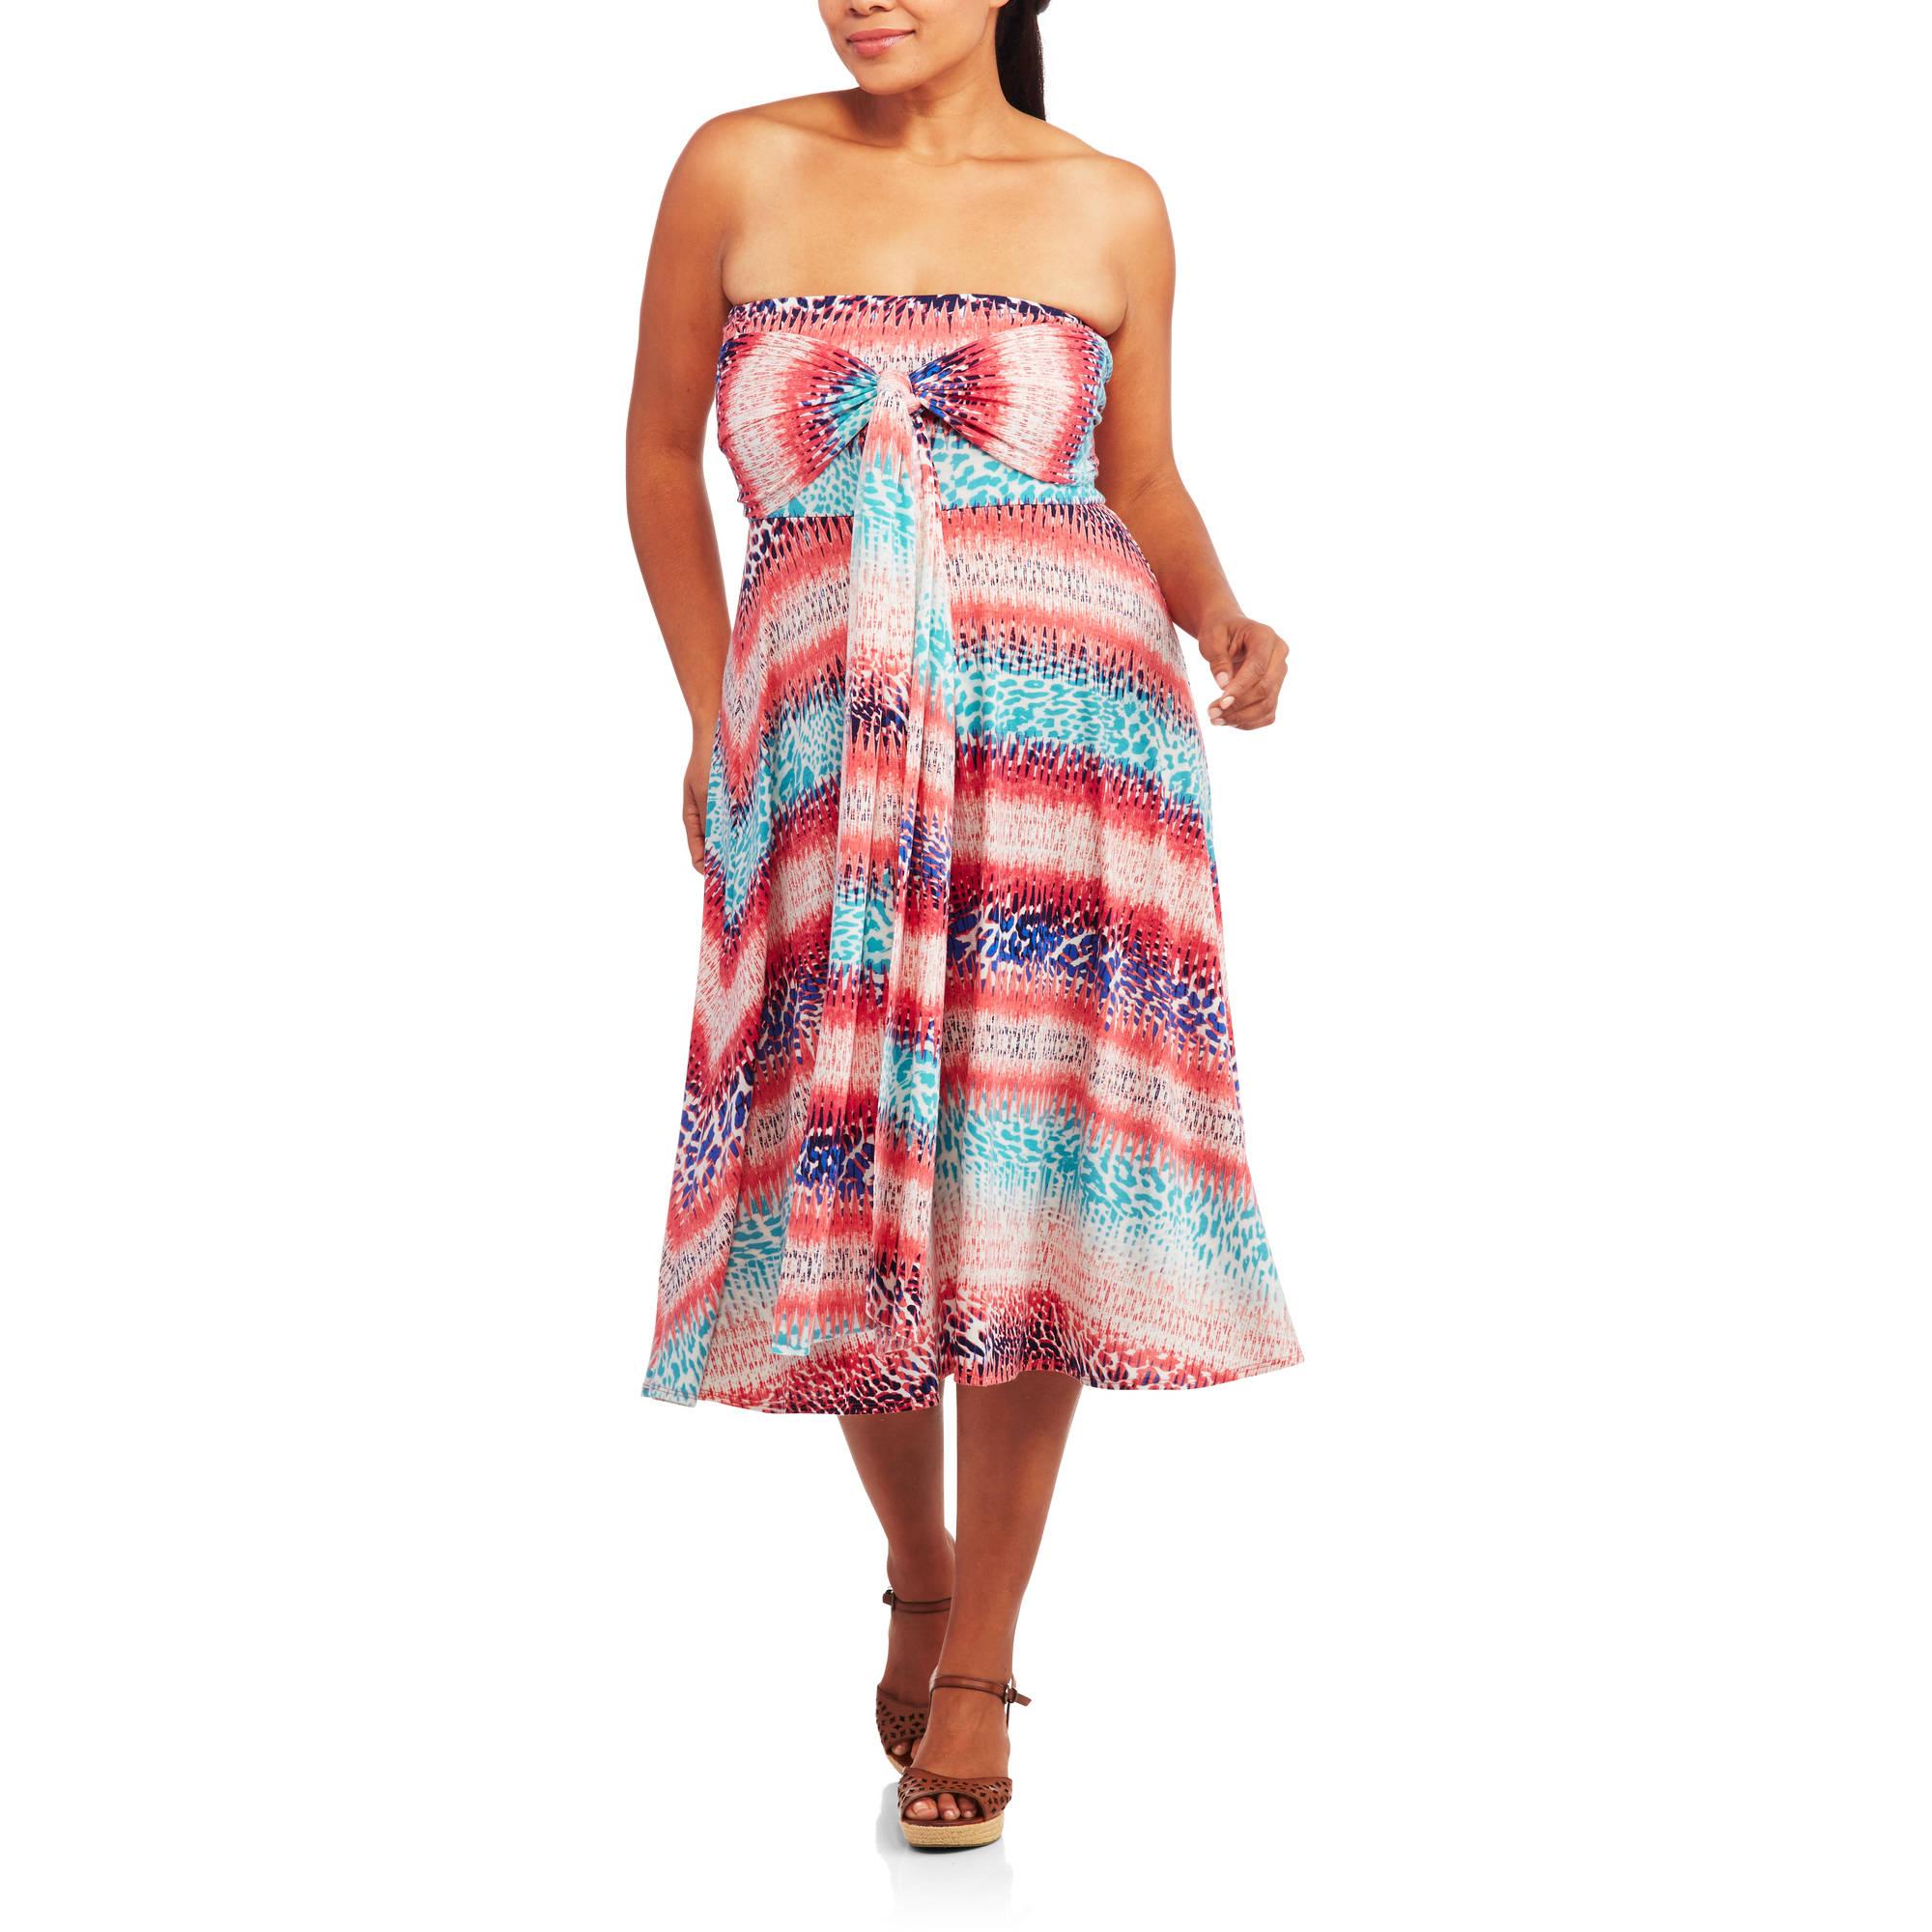 Concepts Women's Plus-Size 8-in-1 Convertible Wrap Dress